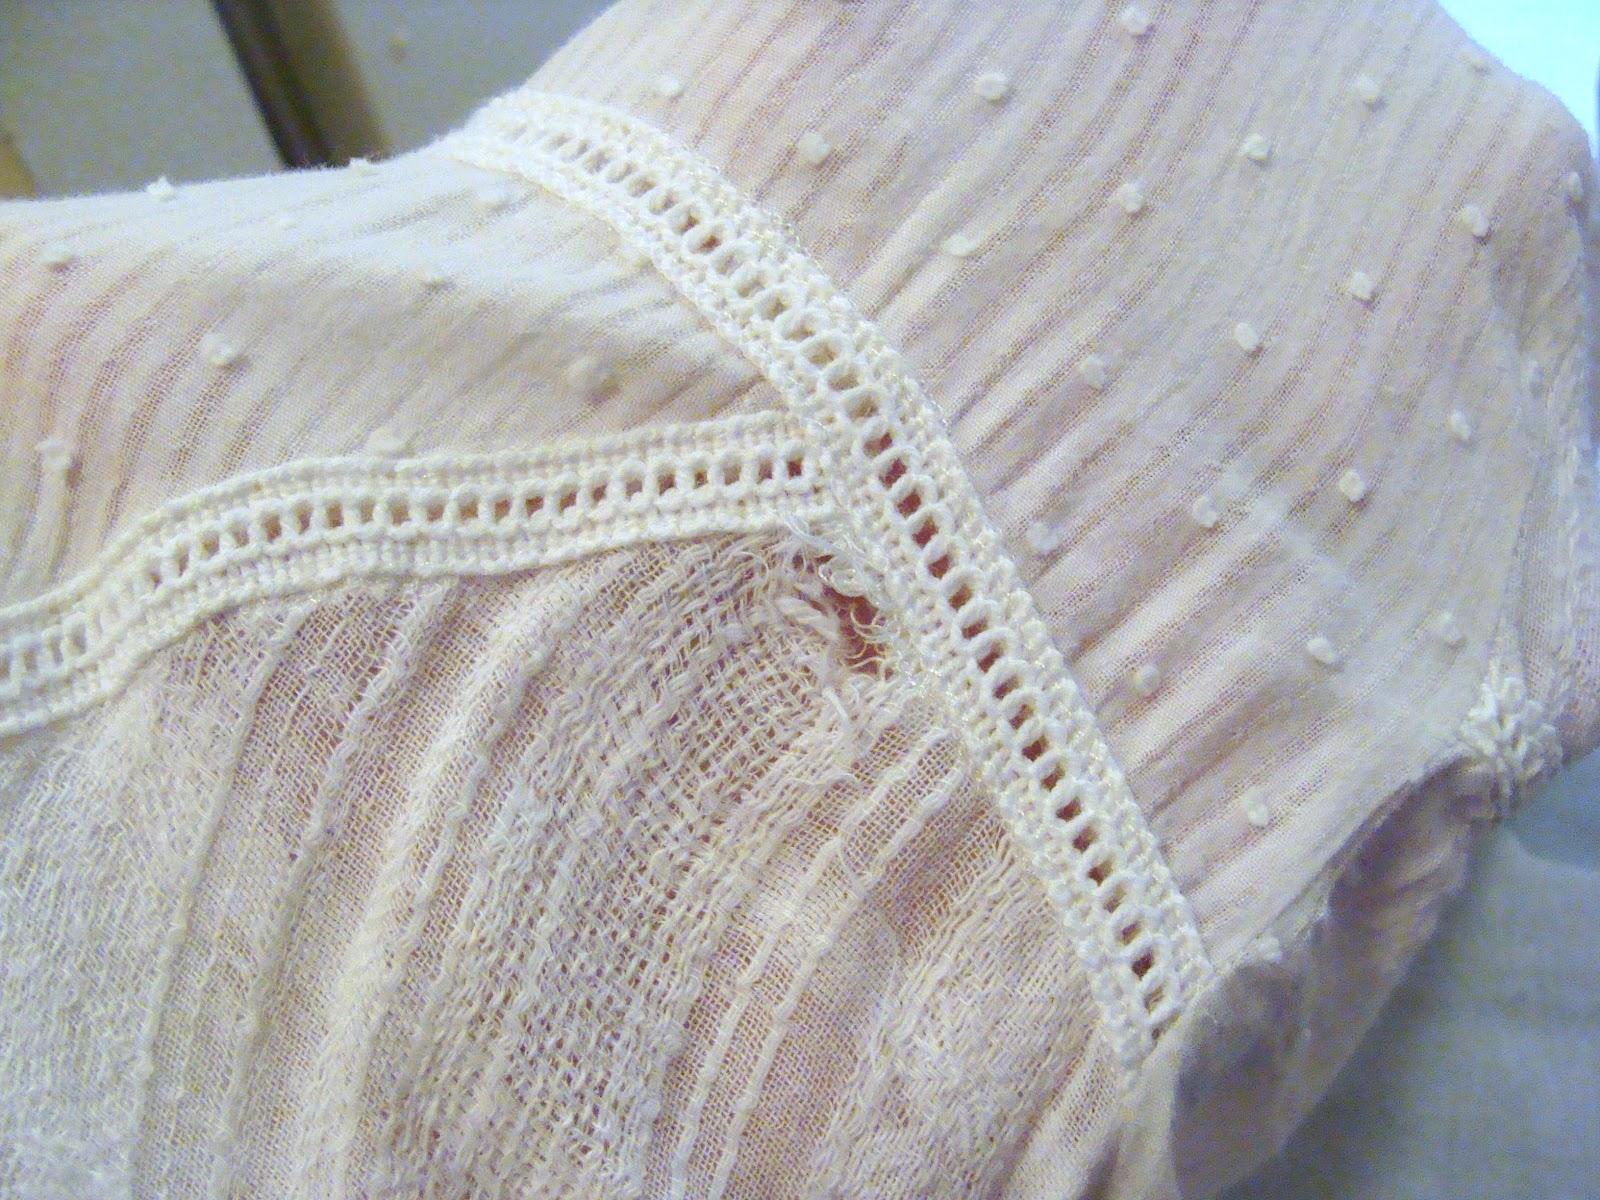 Fix holes in gauze fabricGauze Fabric